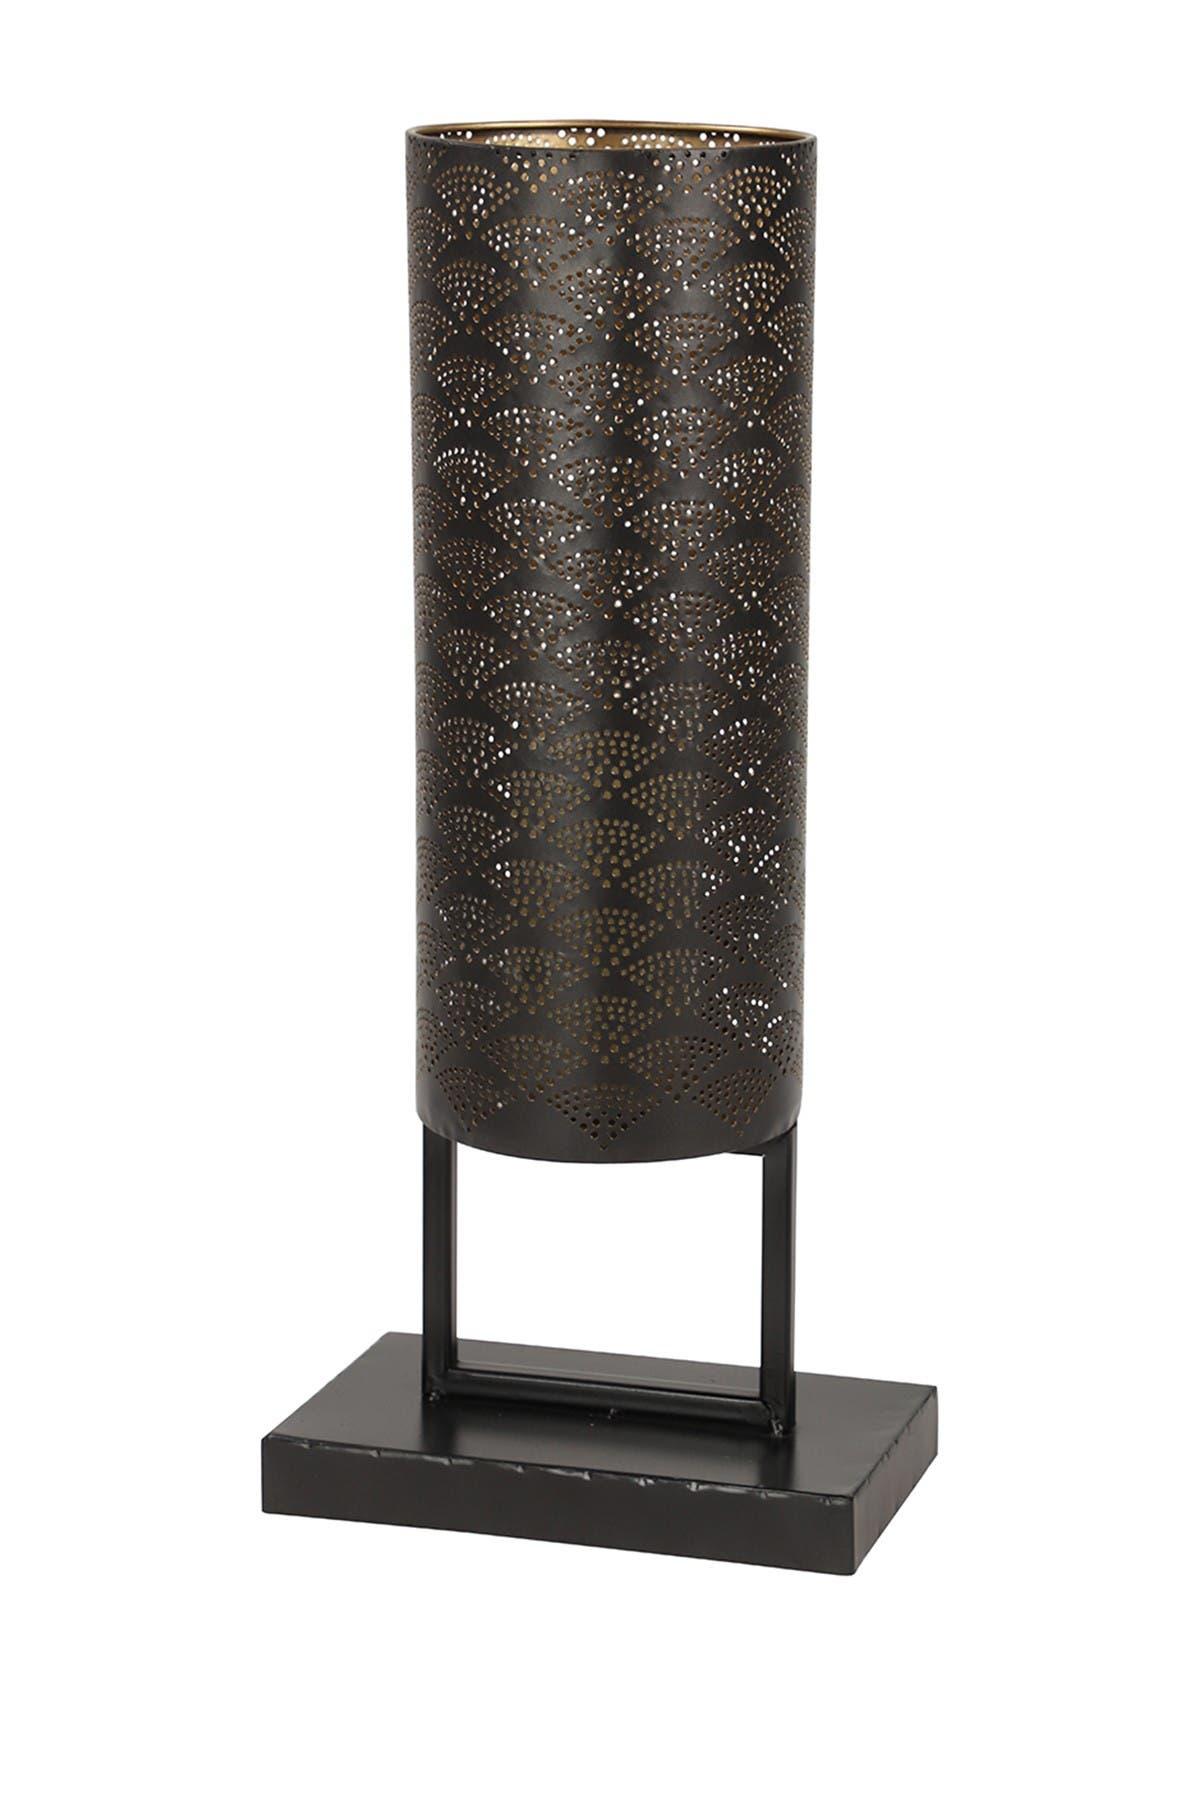 Image of Willow Row Modern Style Large Black Cylinder Metal Lantern with Pierced Metal Boho Pattern on Metal Base